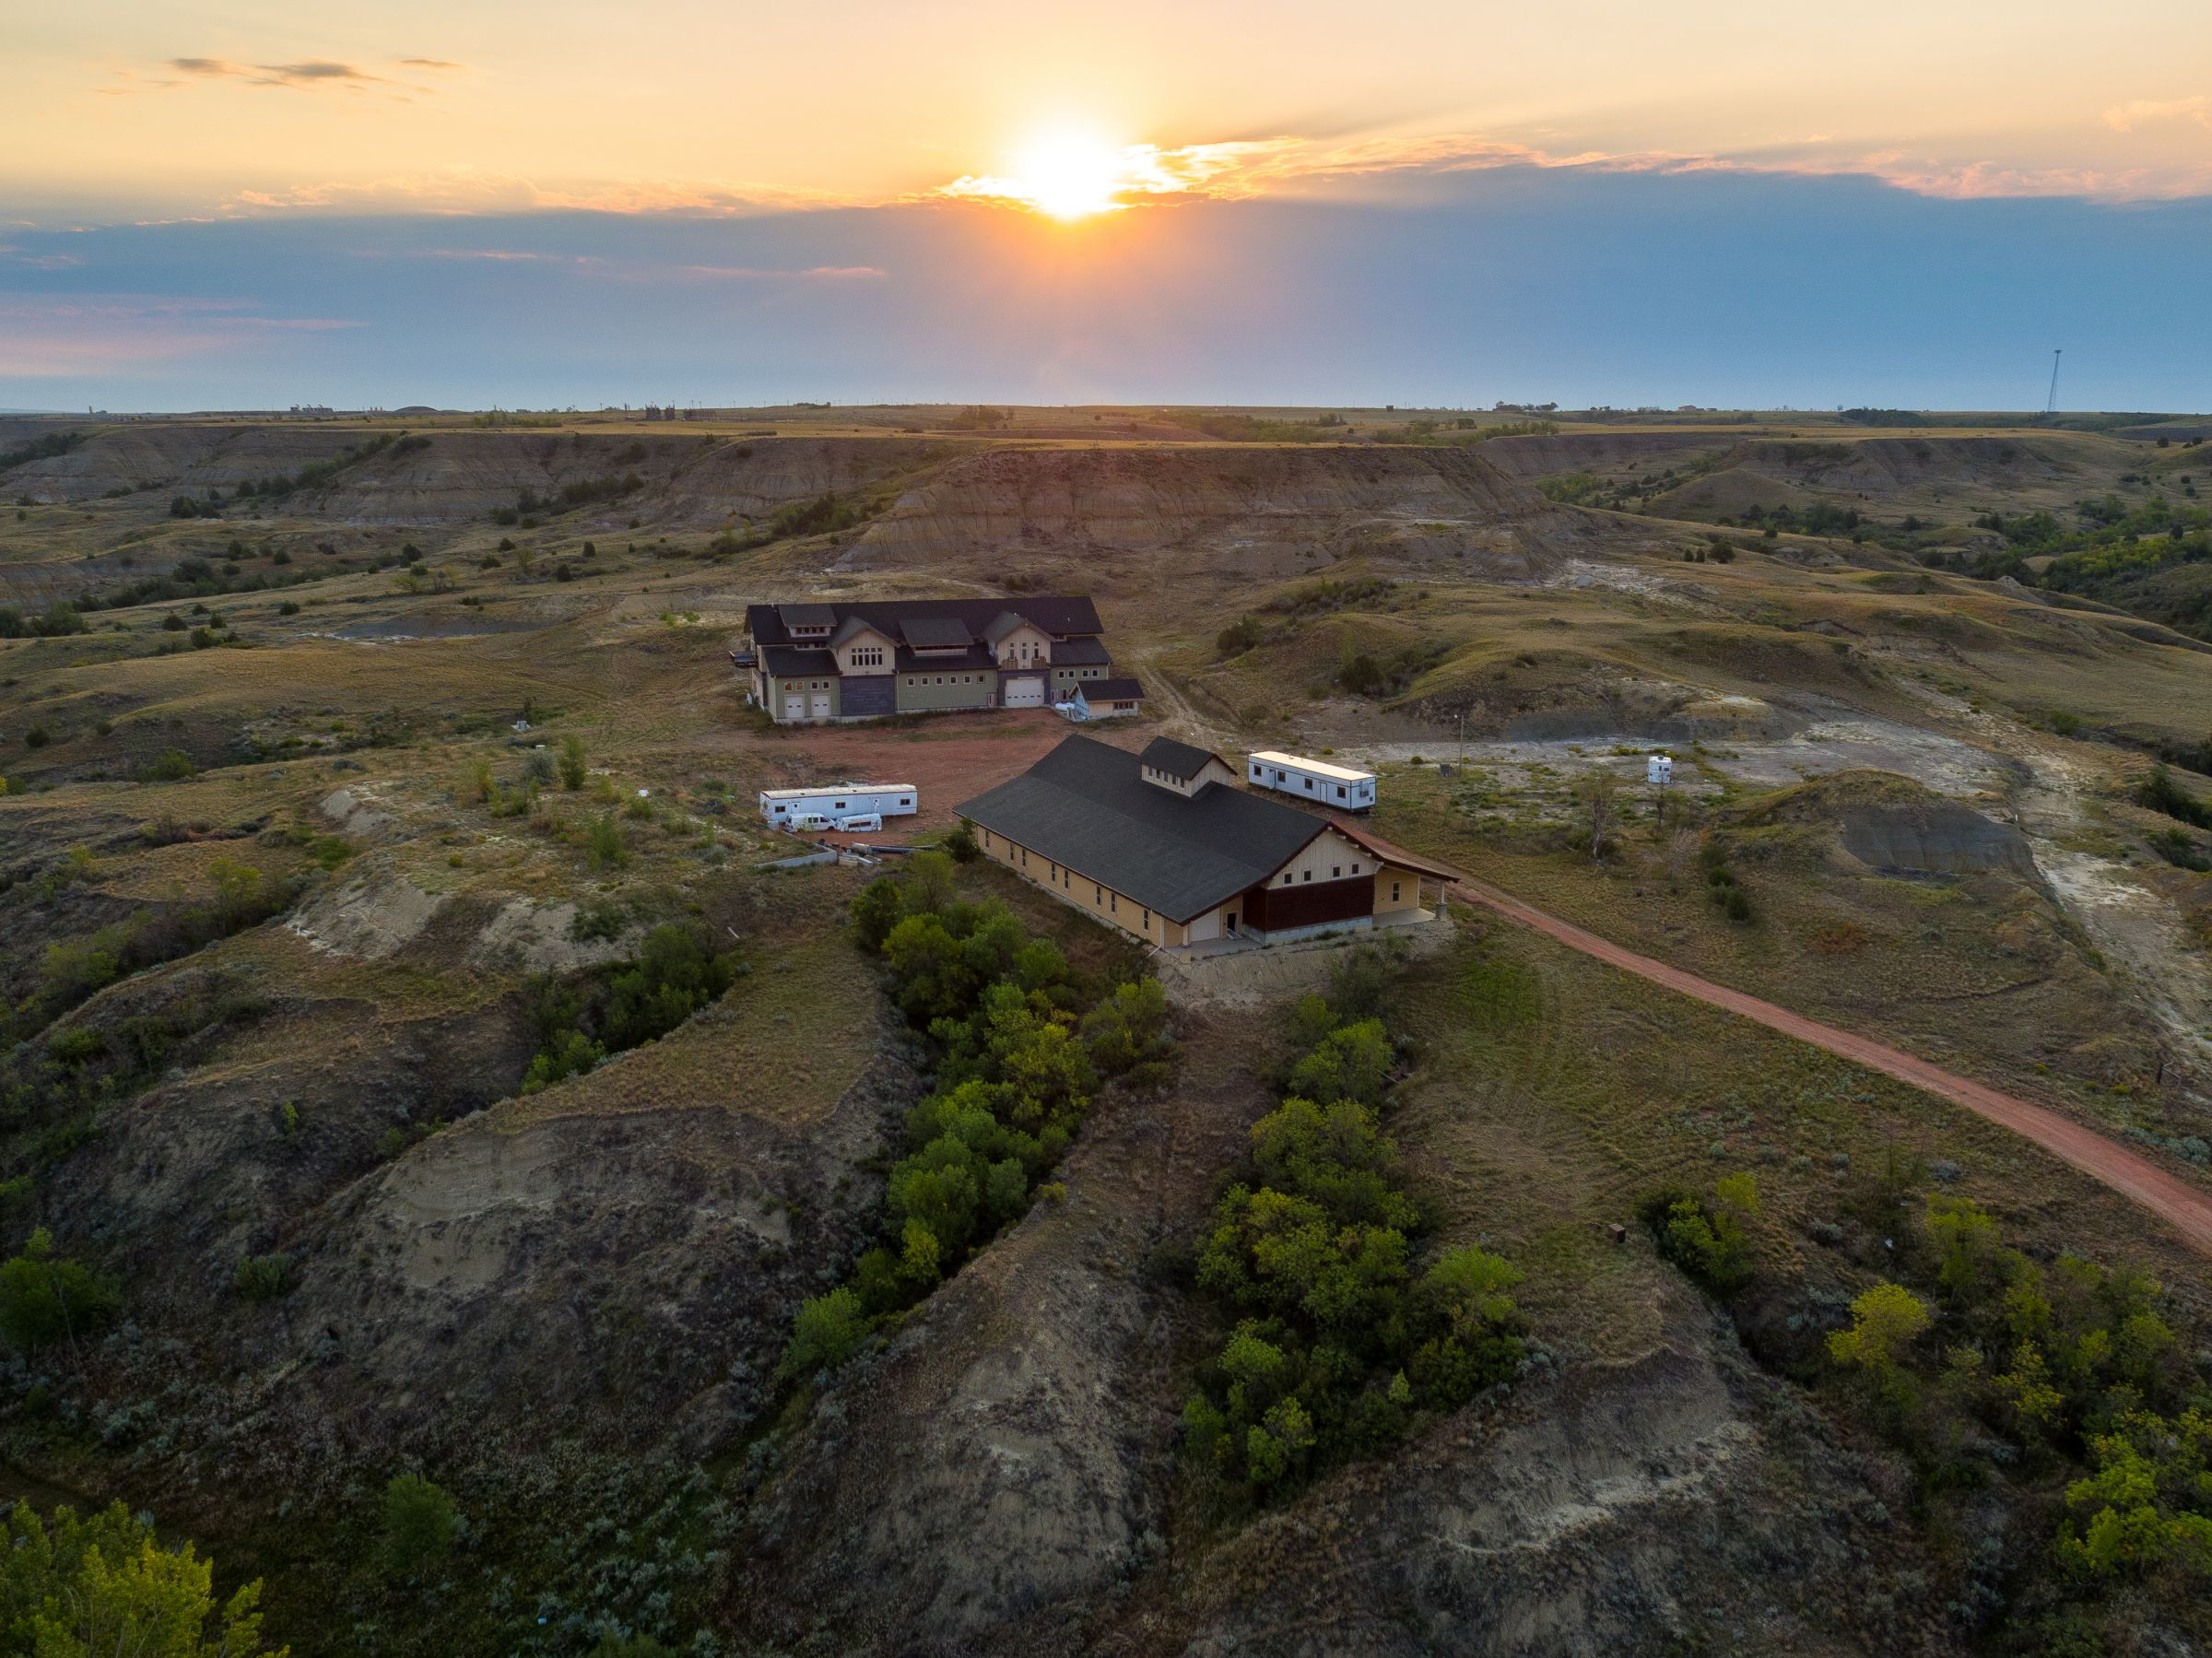 auctions-land-mckenzie-county-north-dakota-270-acres-listing-number-15735-0-2021-09-10-135951.jpeg